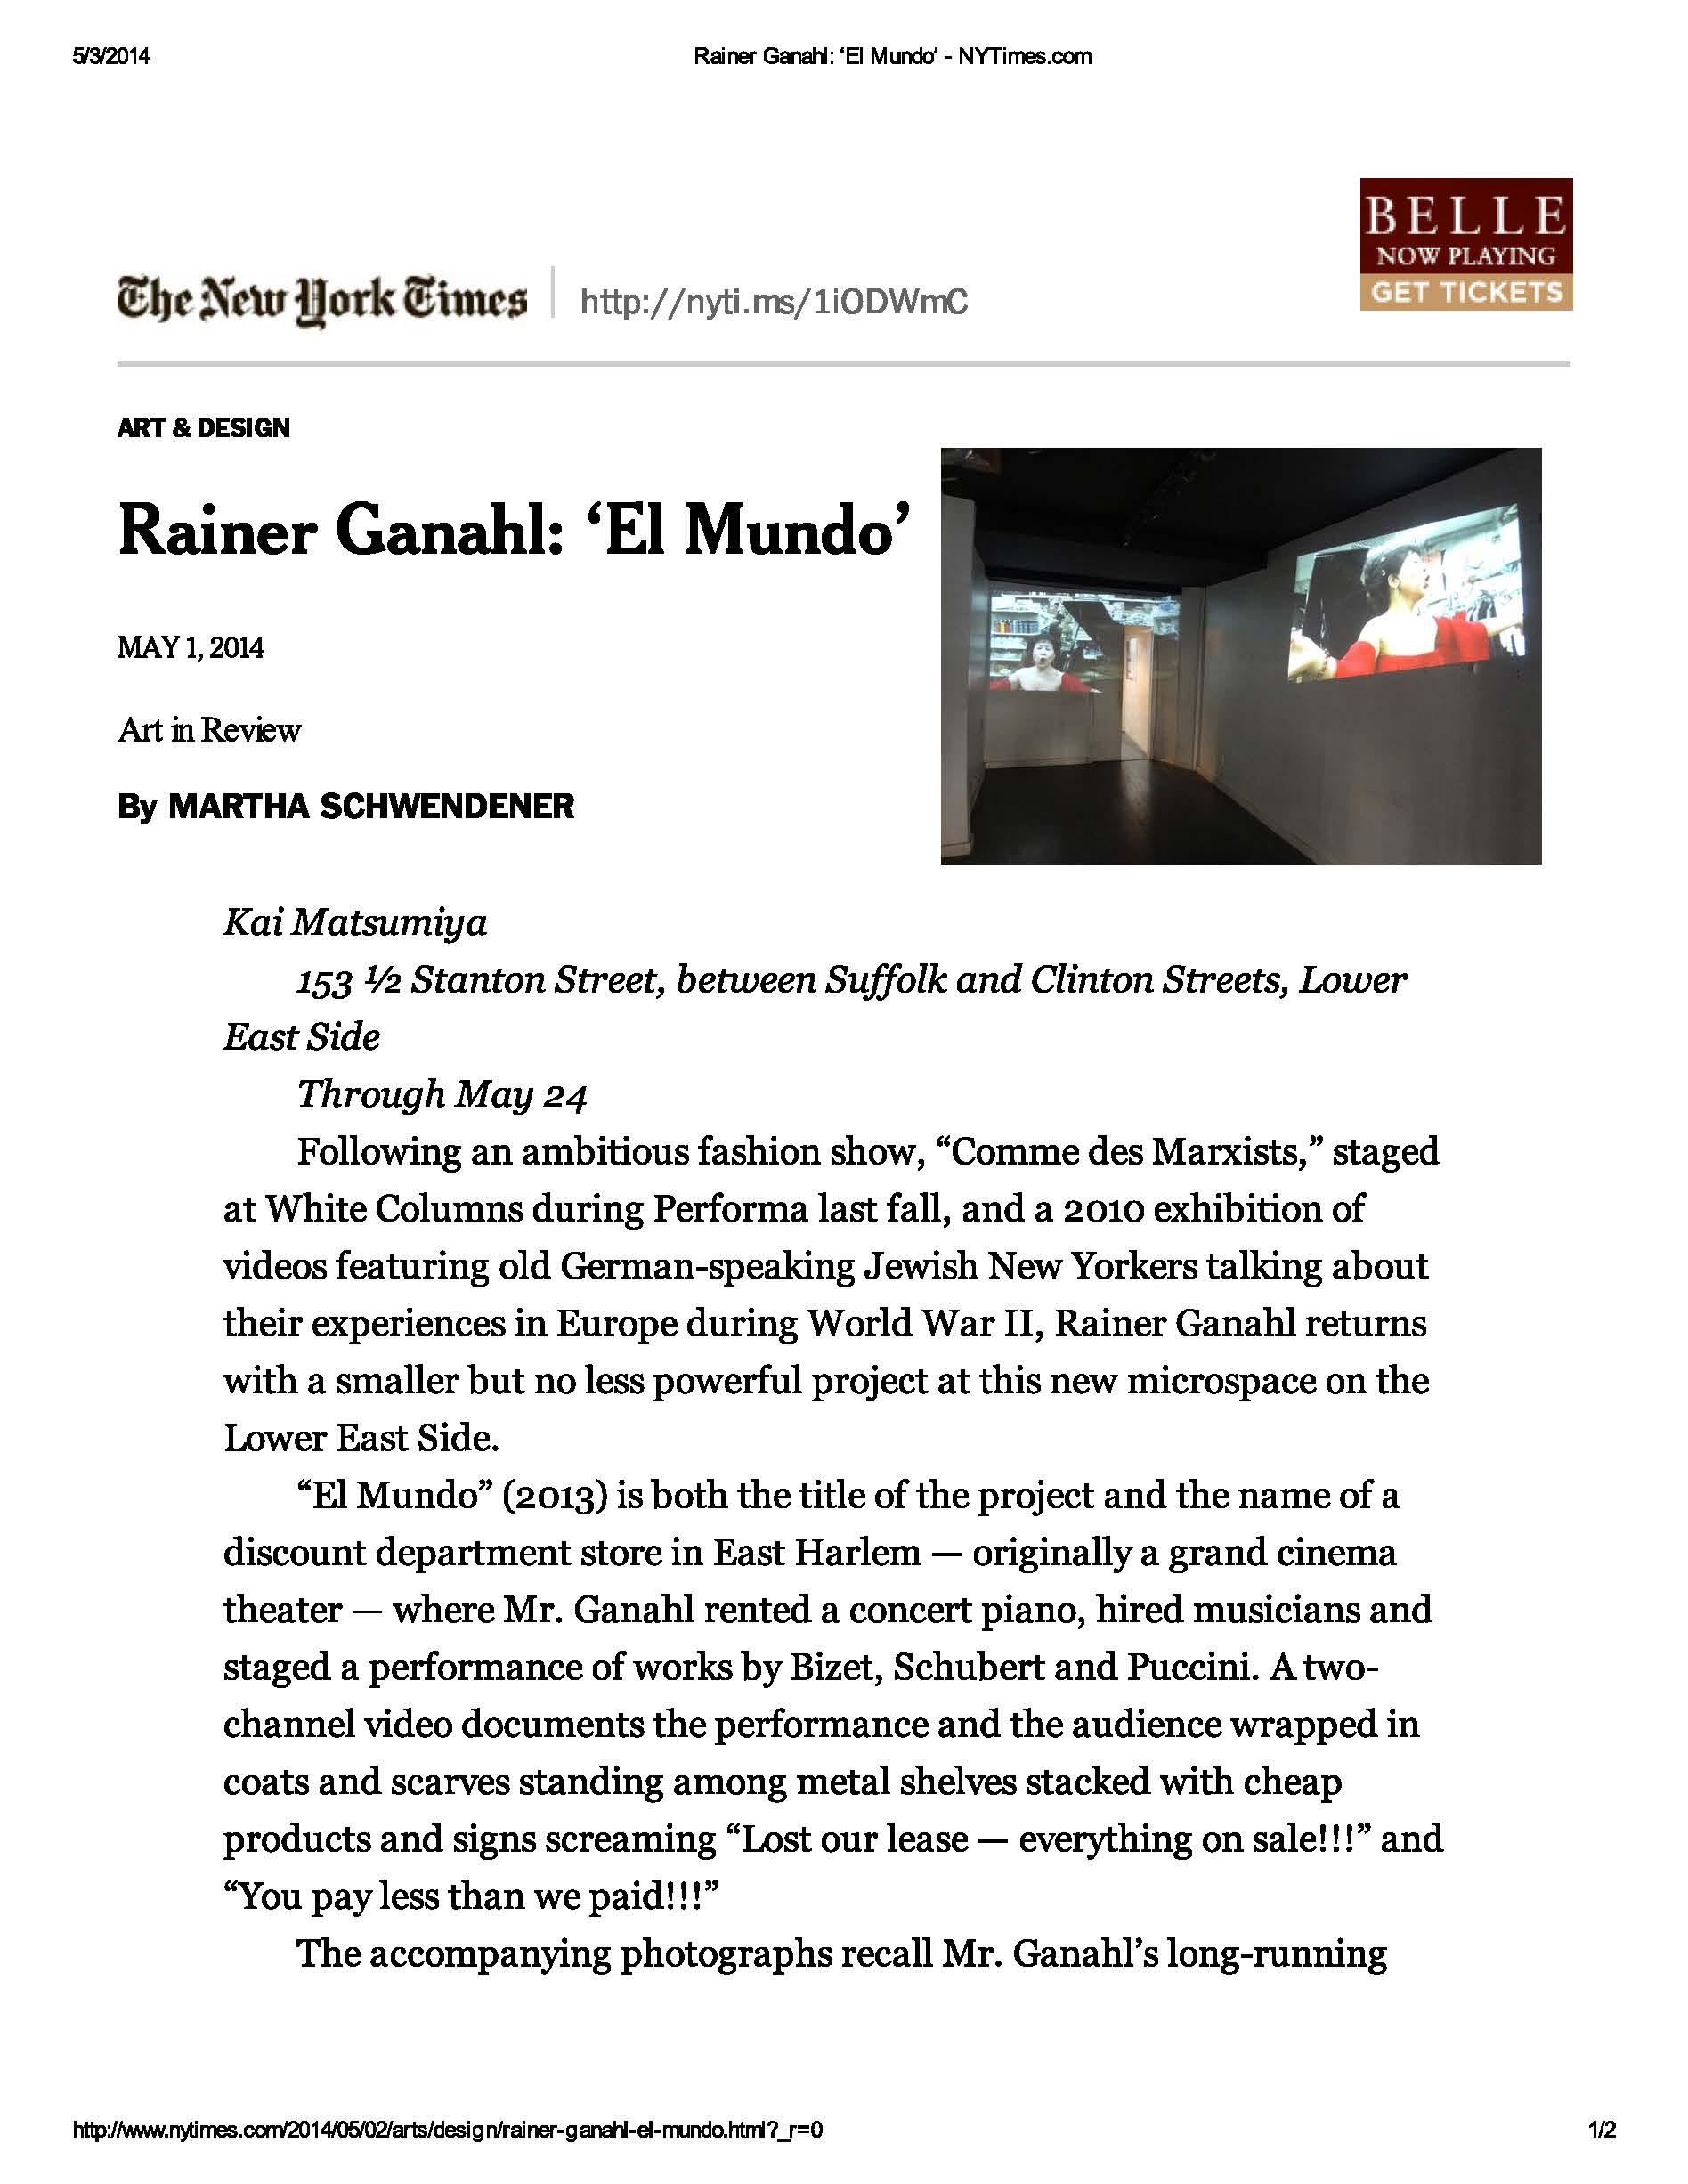 Rainer Ganahl_ 'El Mundo' - NYTimes_Page_1.jpg